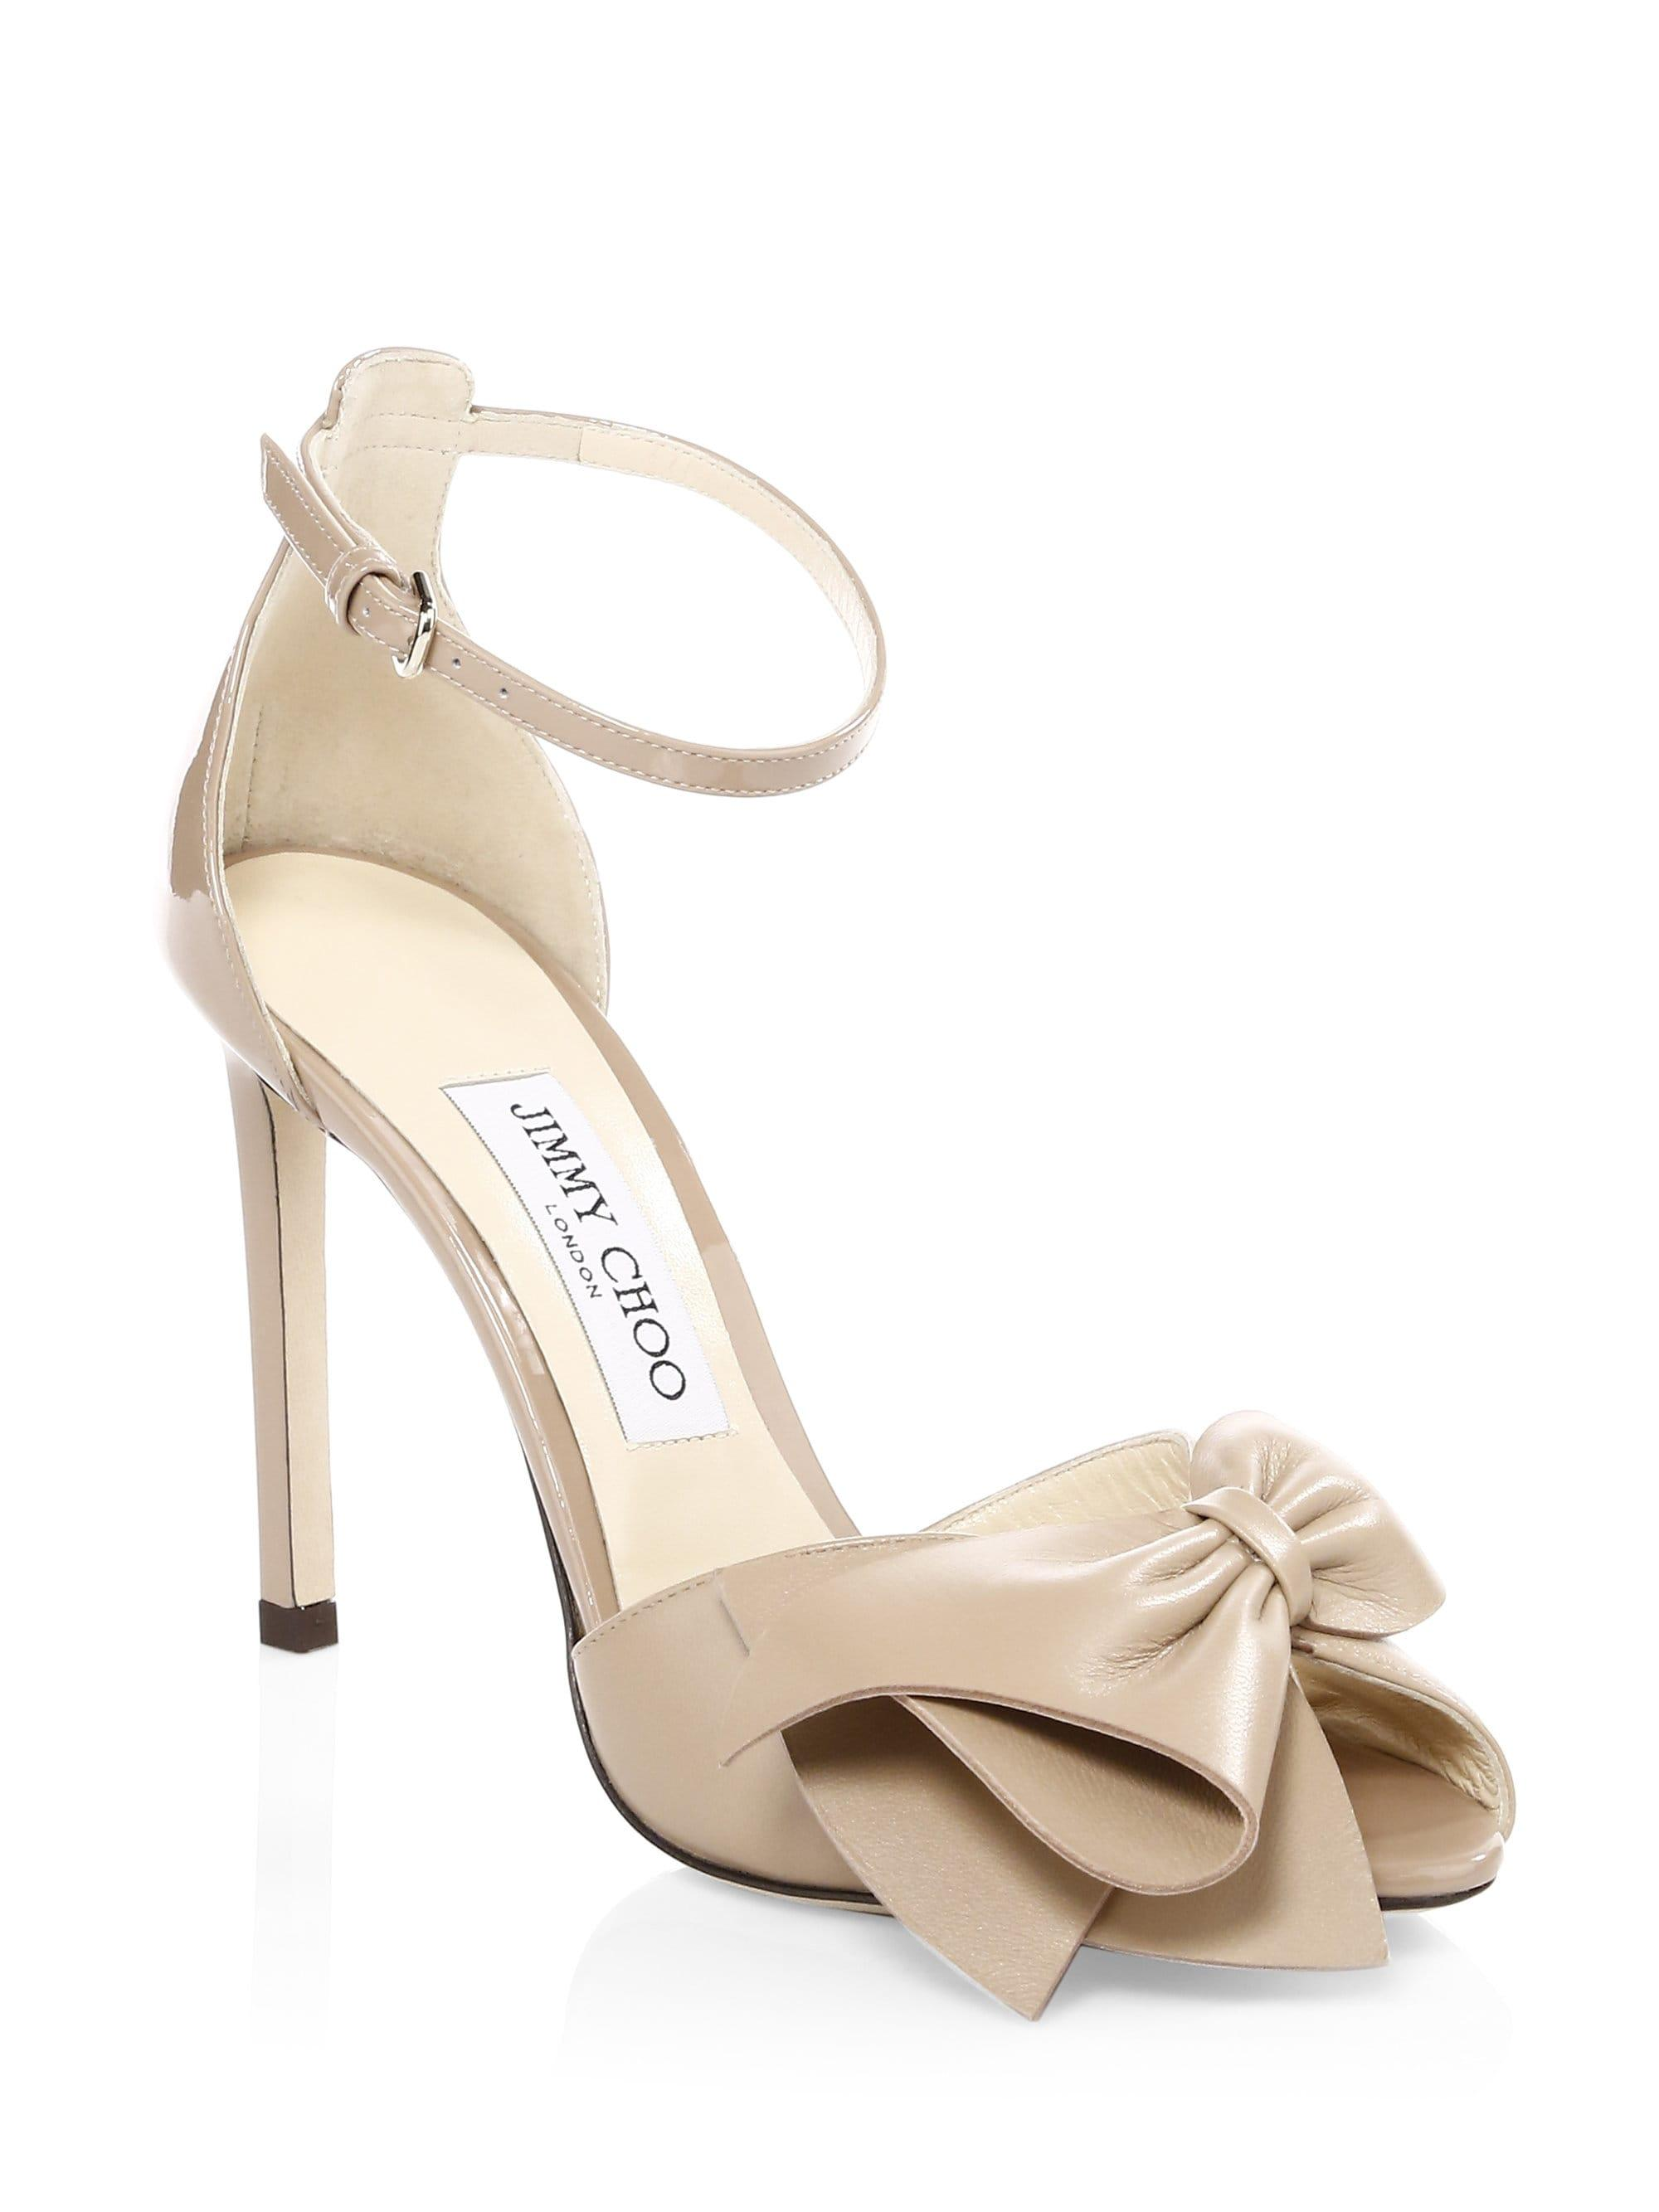 05da026c30 Jimmy Choo Women's Karlotta Peep Toe Heels - Black - Lyst